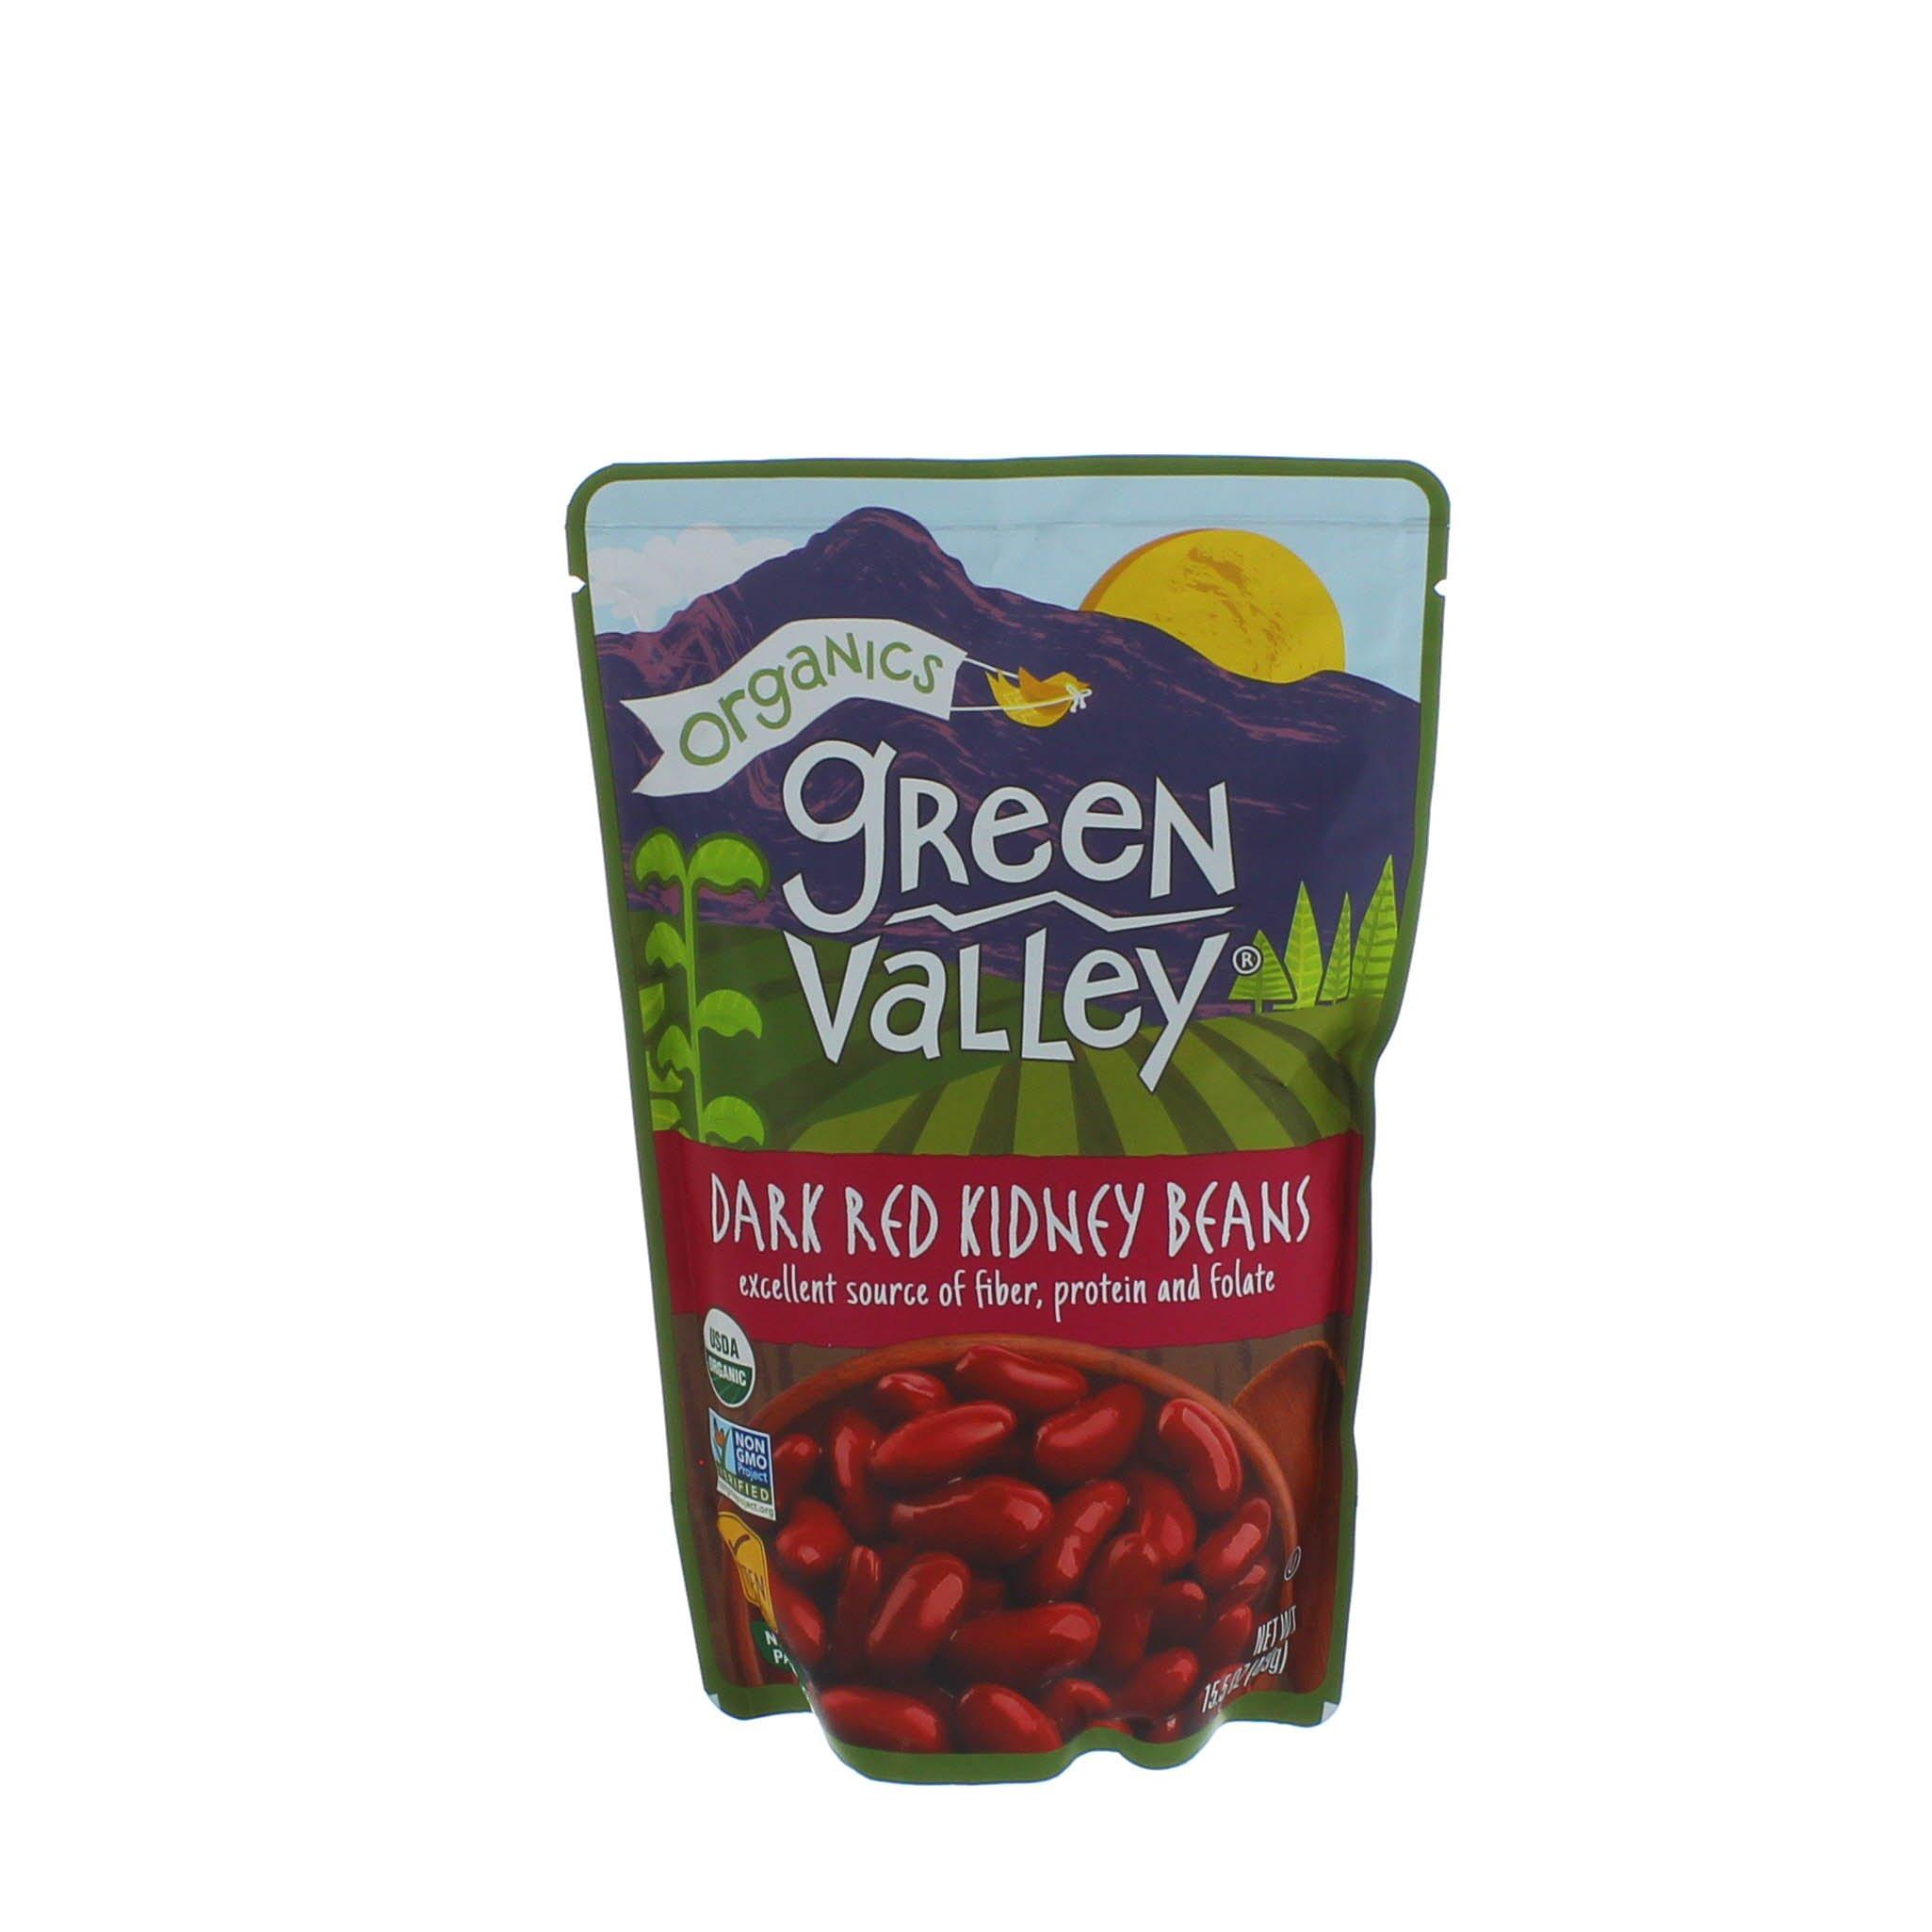 Green Valley Organics Dark Red Kidney Beans Shop Beans Legumes At H E B